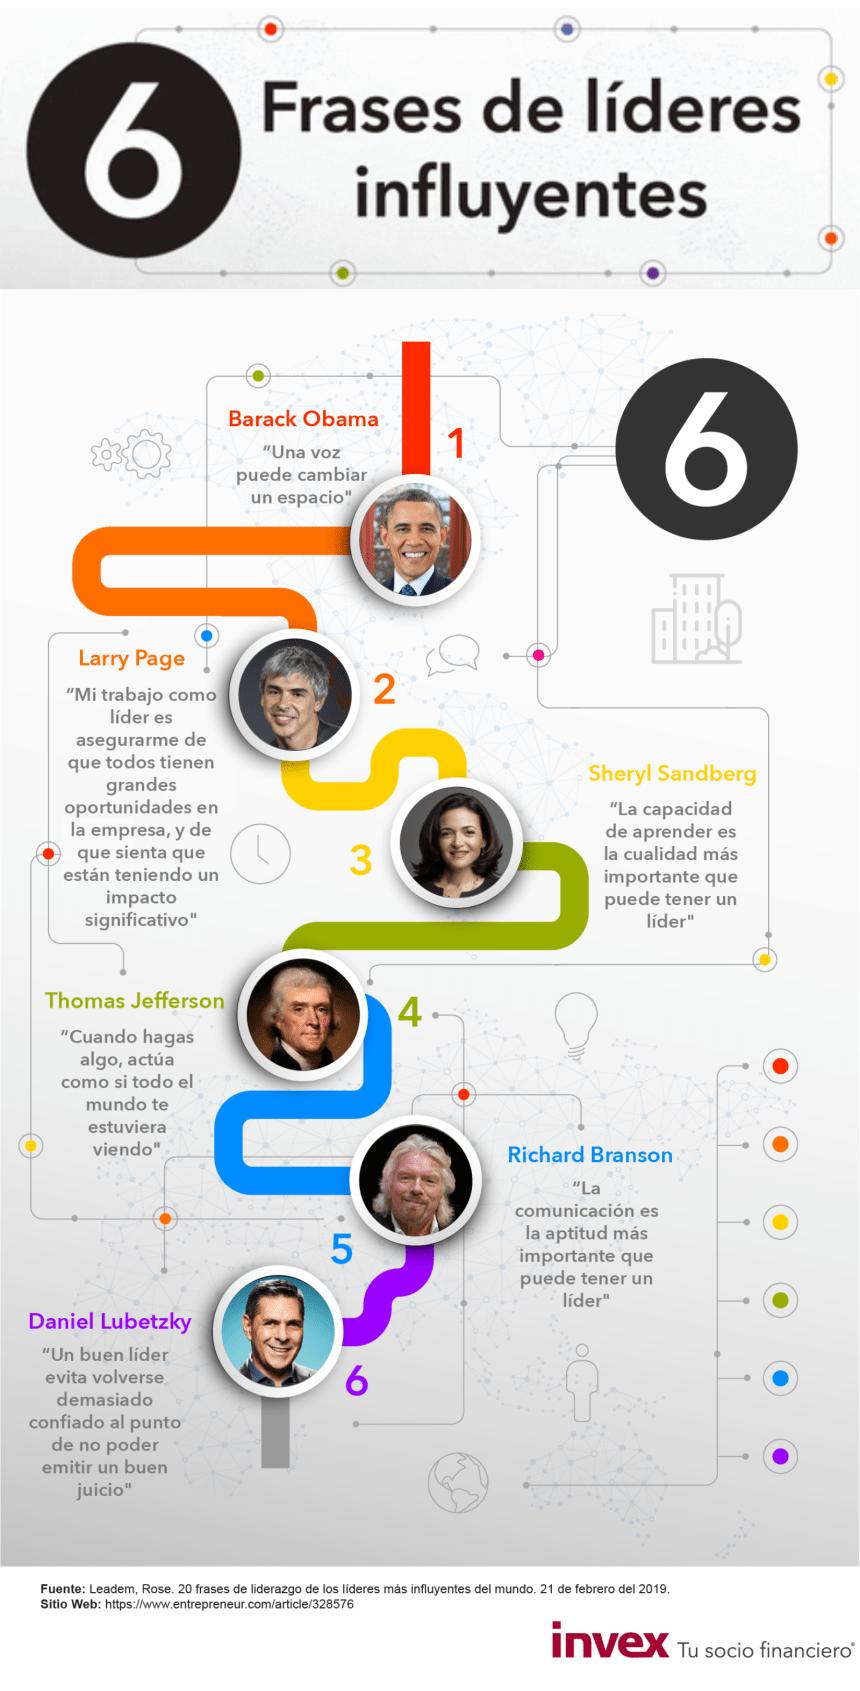 6 frases del líderes influyentes